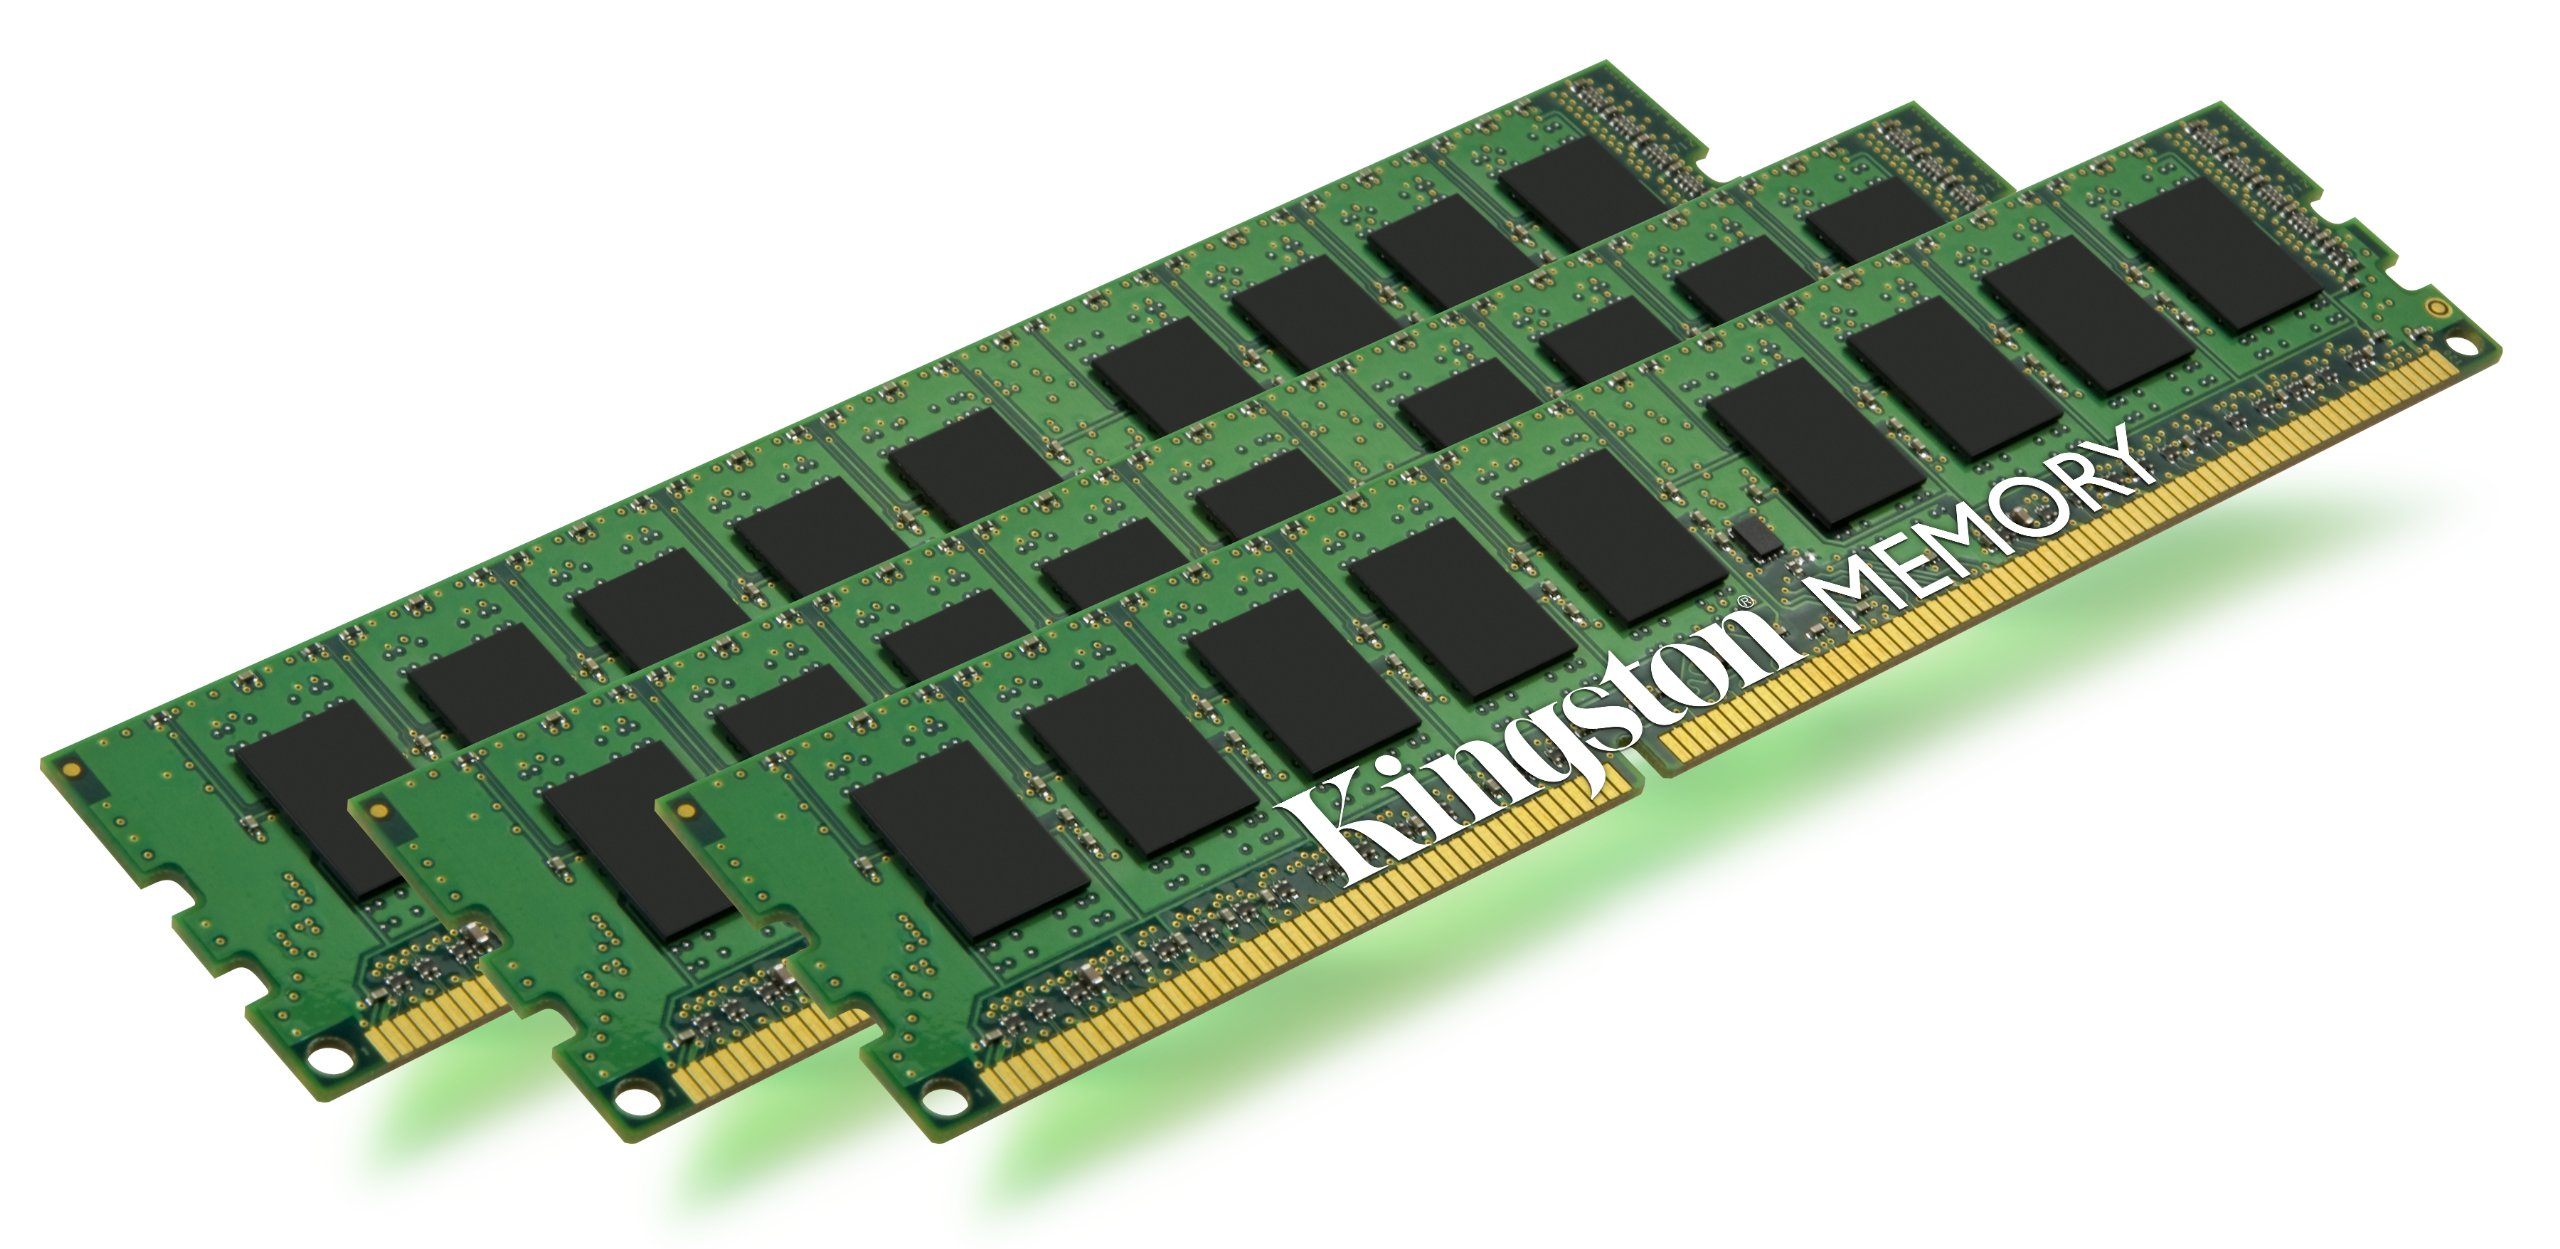 Kingston 2 GB DDR3 SDRAM Memory Module 2 GB (1 x 2 GB) 1066MHz DDR31066/PC38500 ECC DDR3 SDRAM KTH-PL313E/2G by Kingston